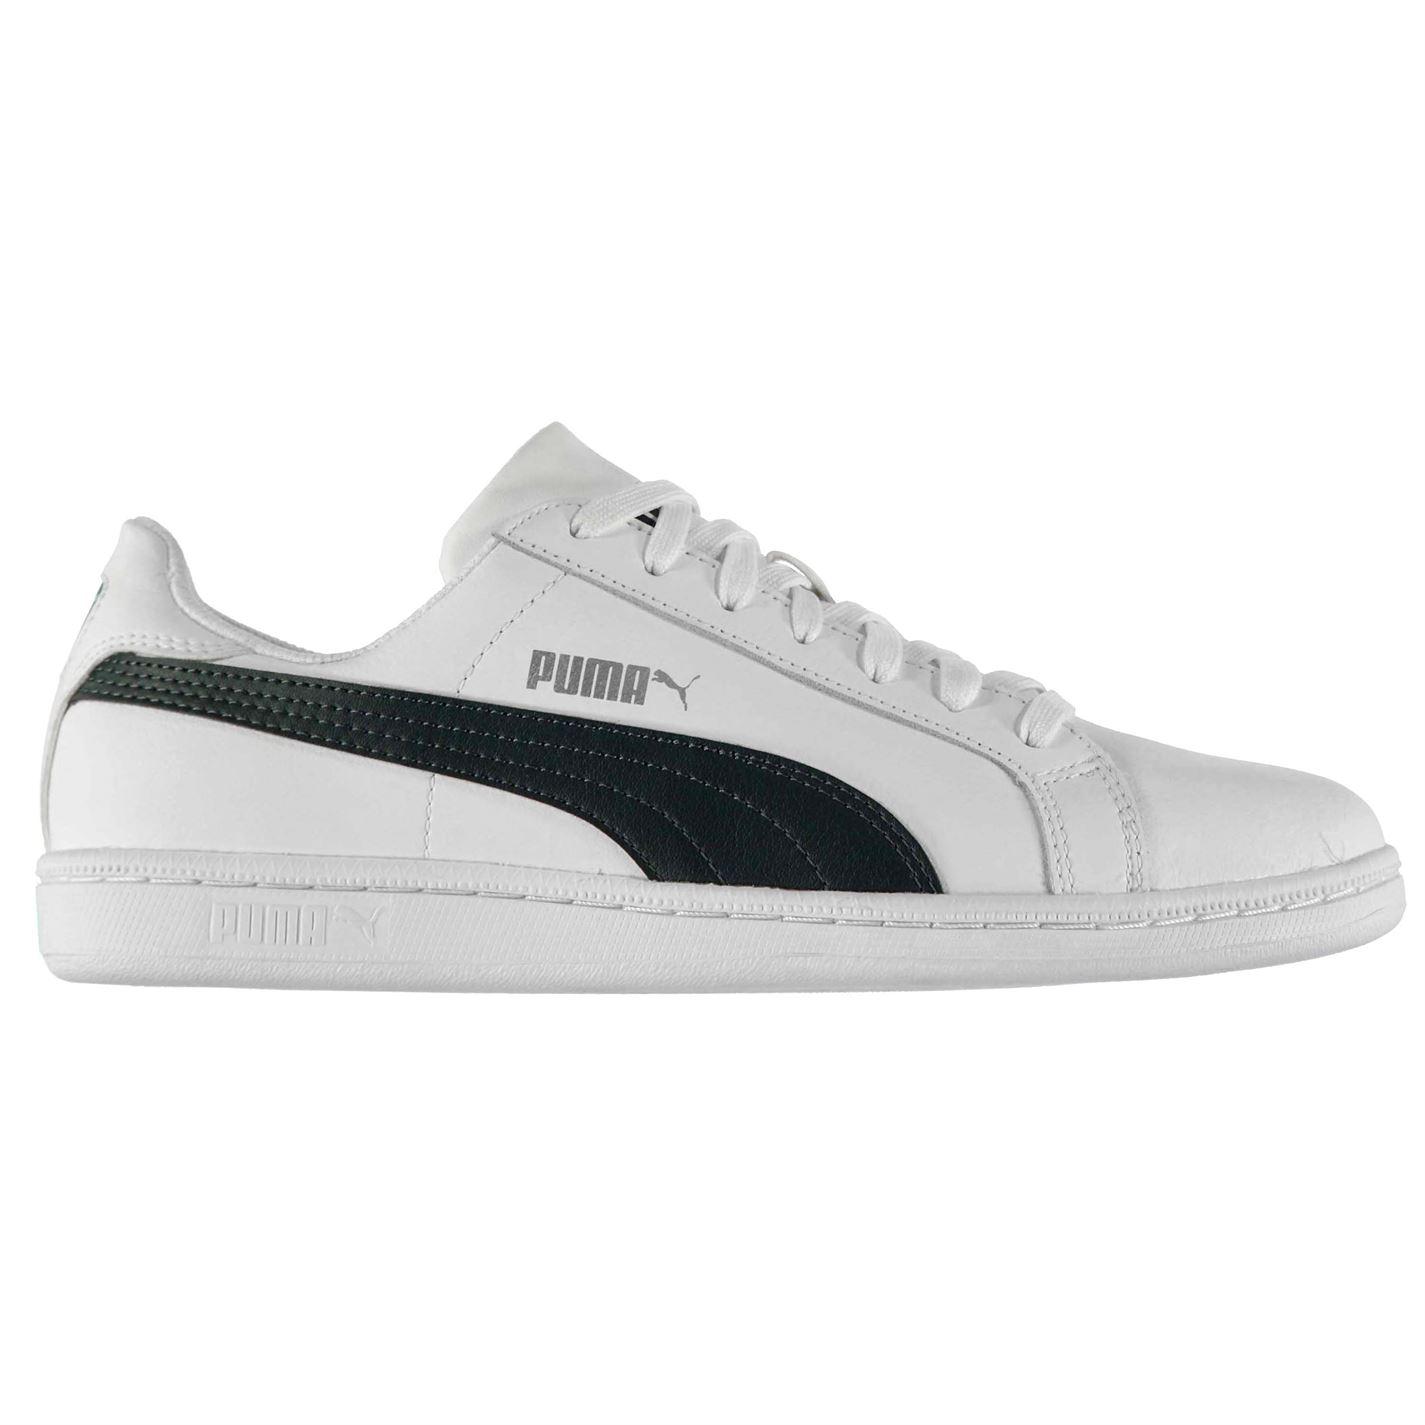 boty Puma Smash Leather pánske